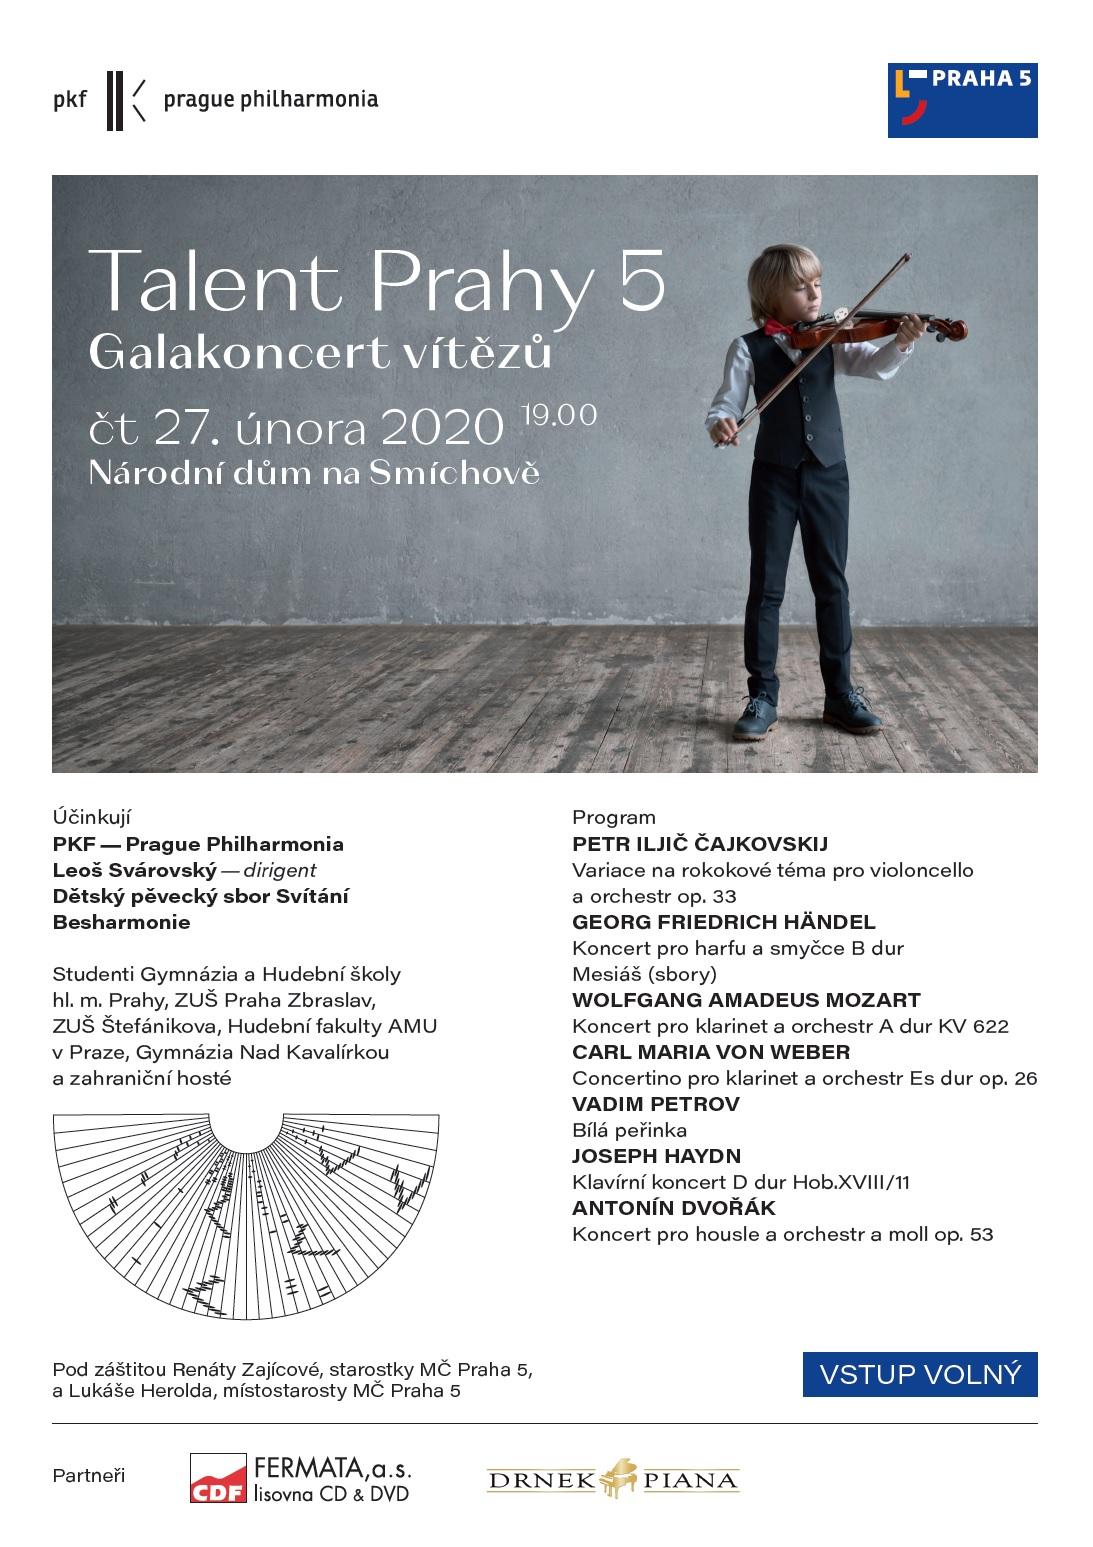 koncert-vitezu-13-rocniku-souteze-talent-prahy-5-v-narodnim-dome-na-smichove